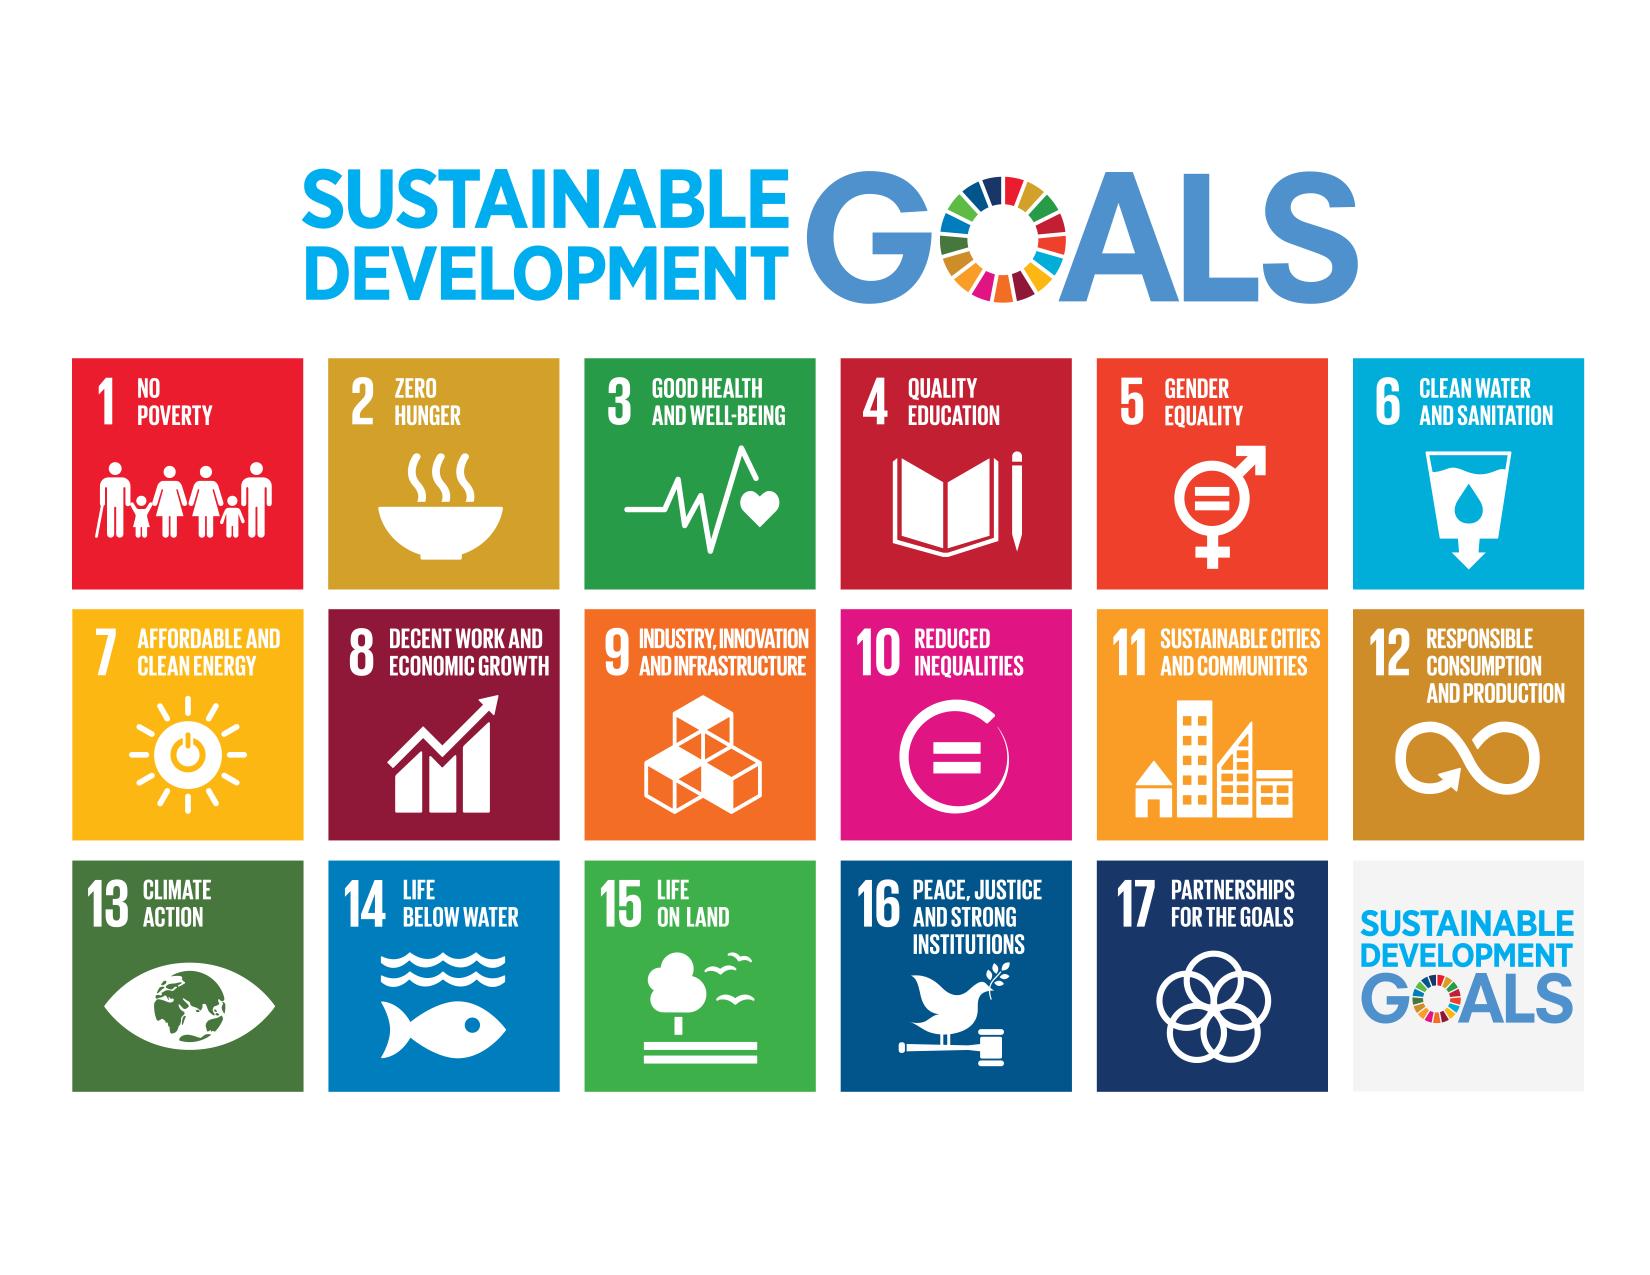 Deakin University Is Proud To Be A Signatory To The University Commitment To The United Nations Sustainable Development Goals Sdgs